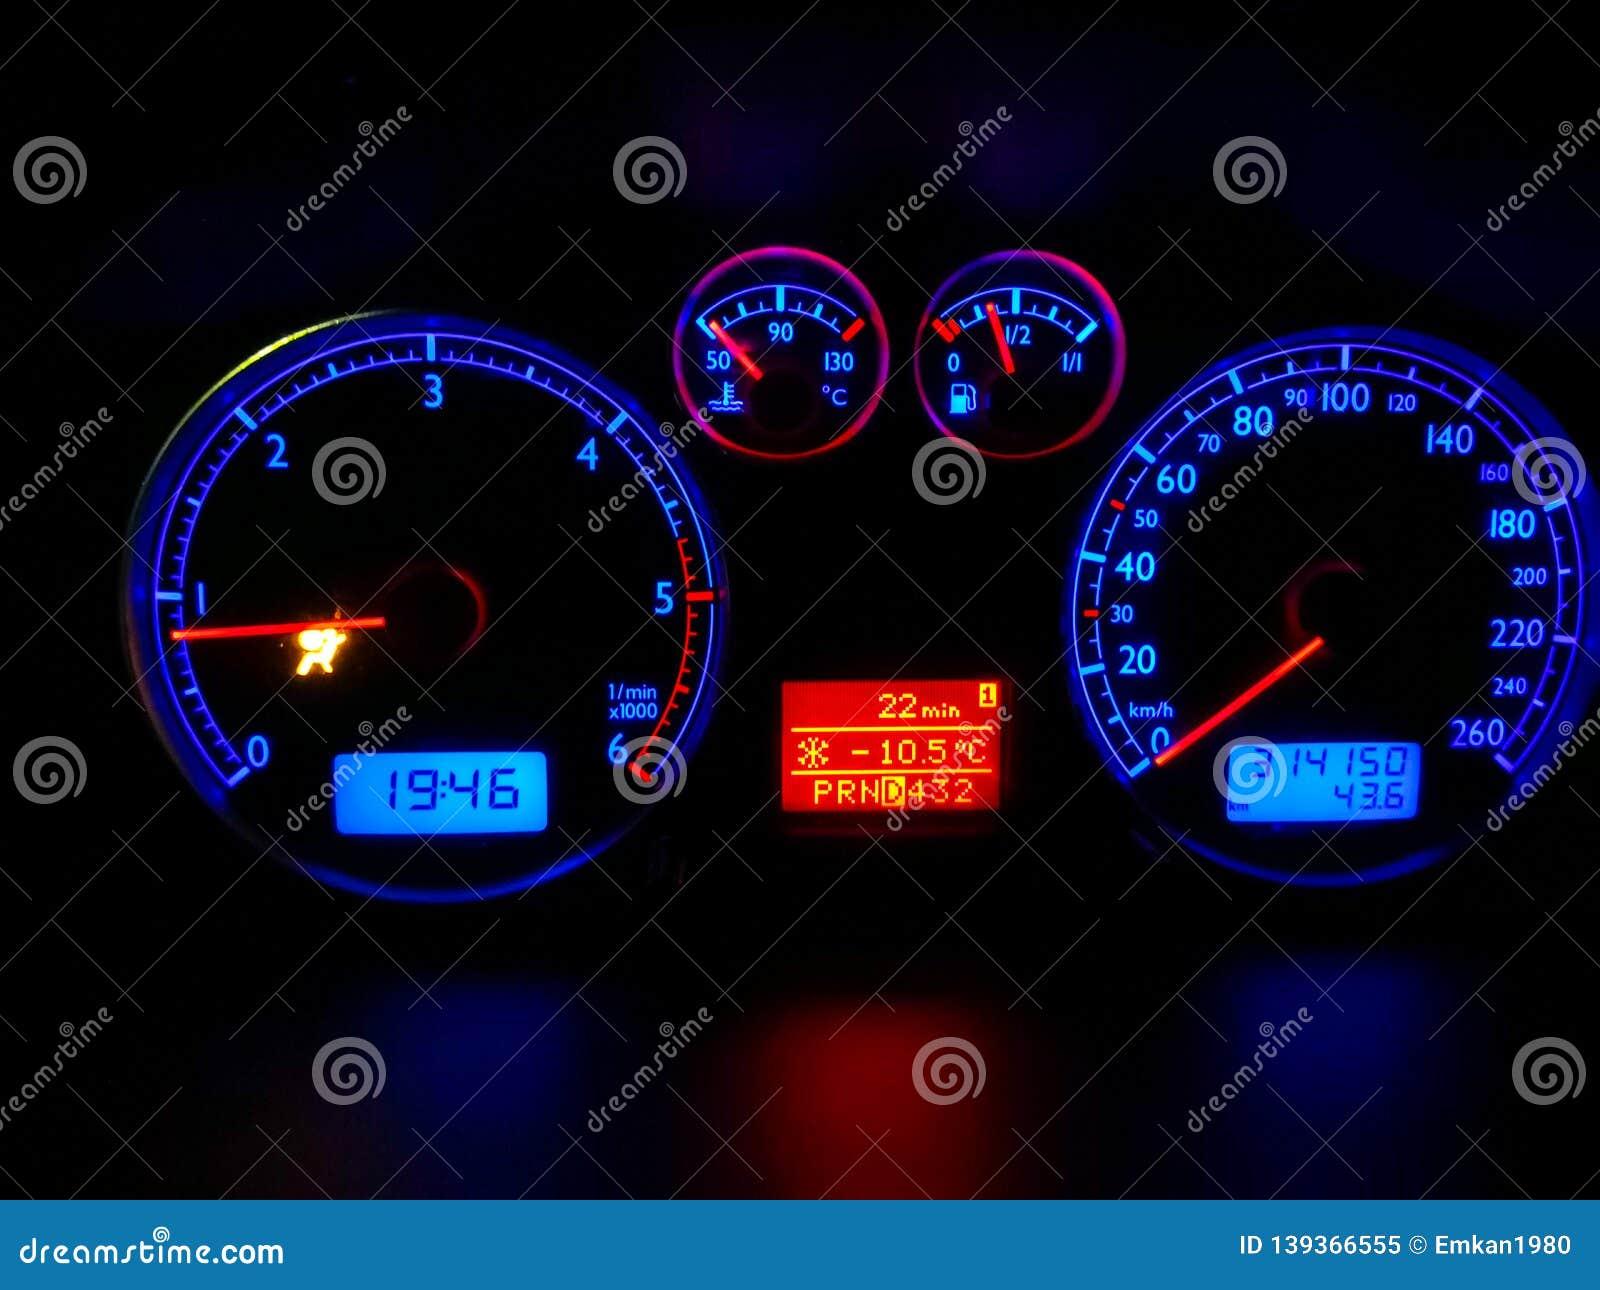 Car Dashboard Modern Automobile Control Panel Stock Image